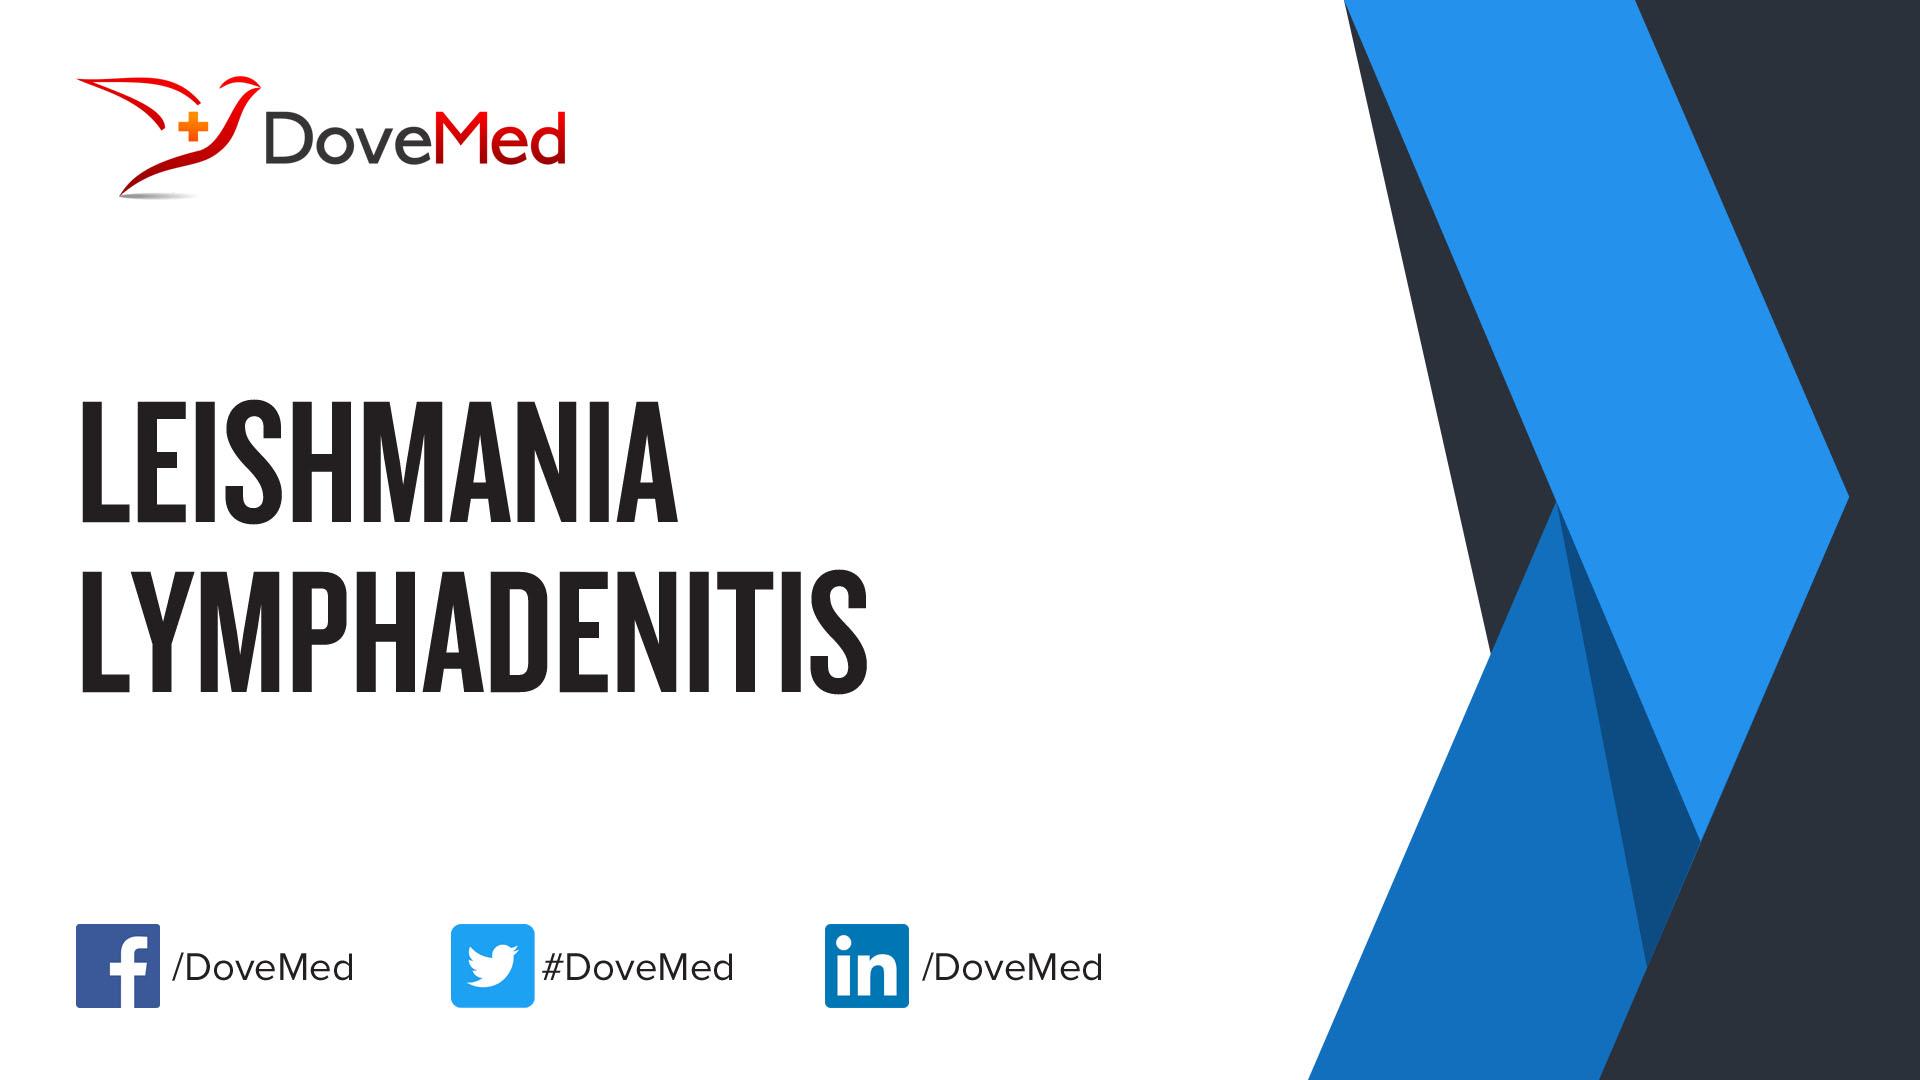 Leishmania Lymphadenitis